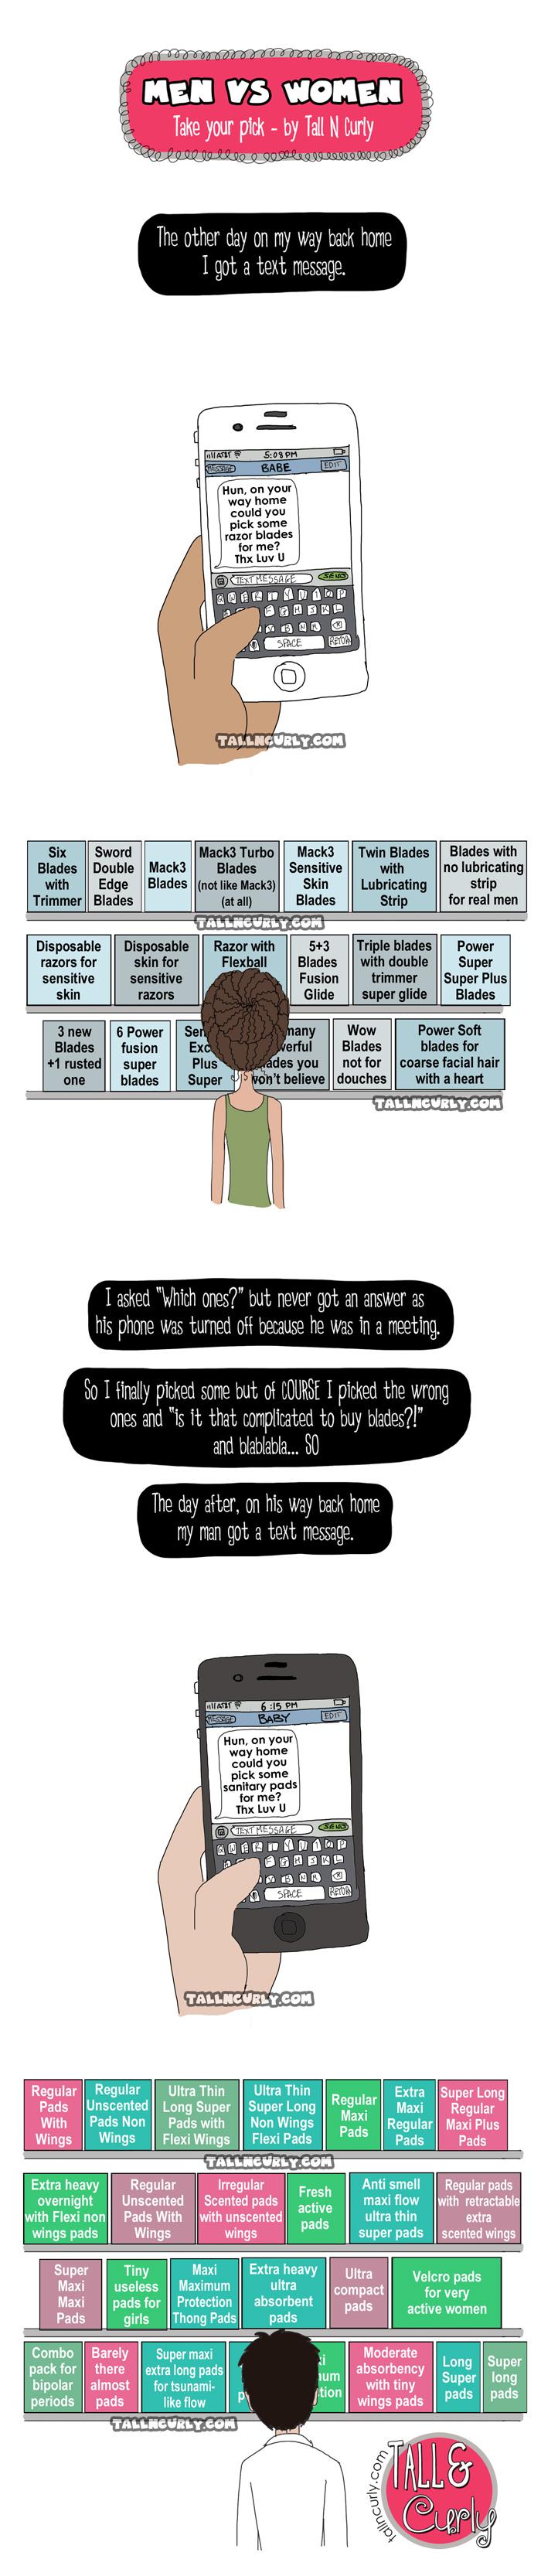 Tall N Curly - Men VS women - Razor blades and sanitary pads